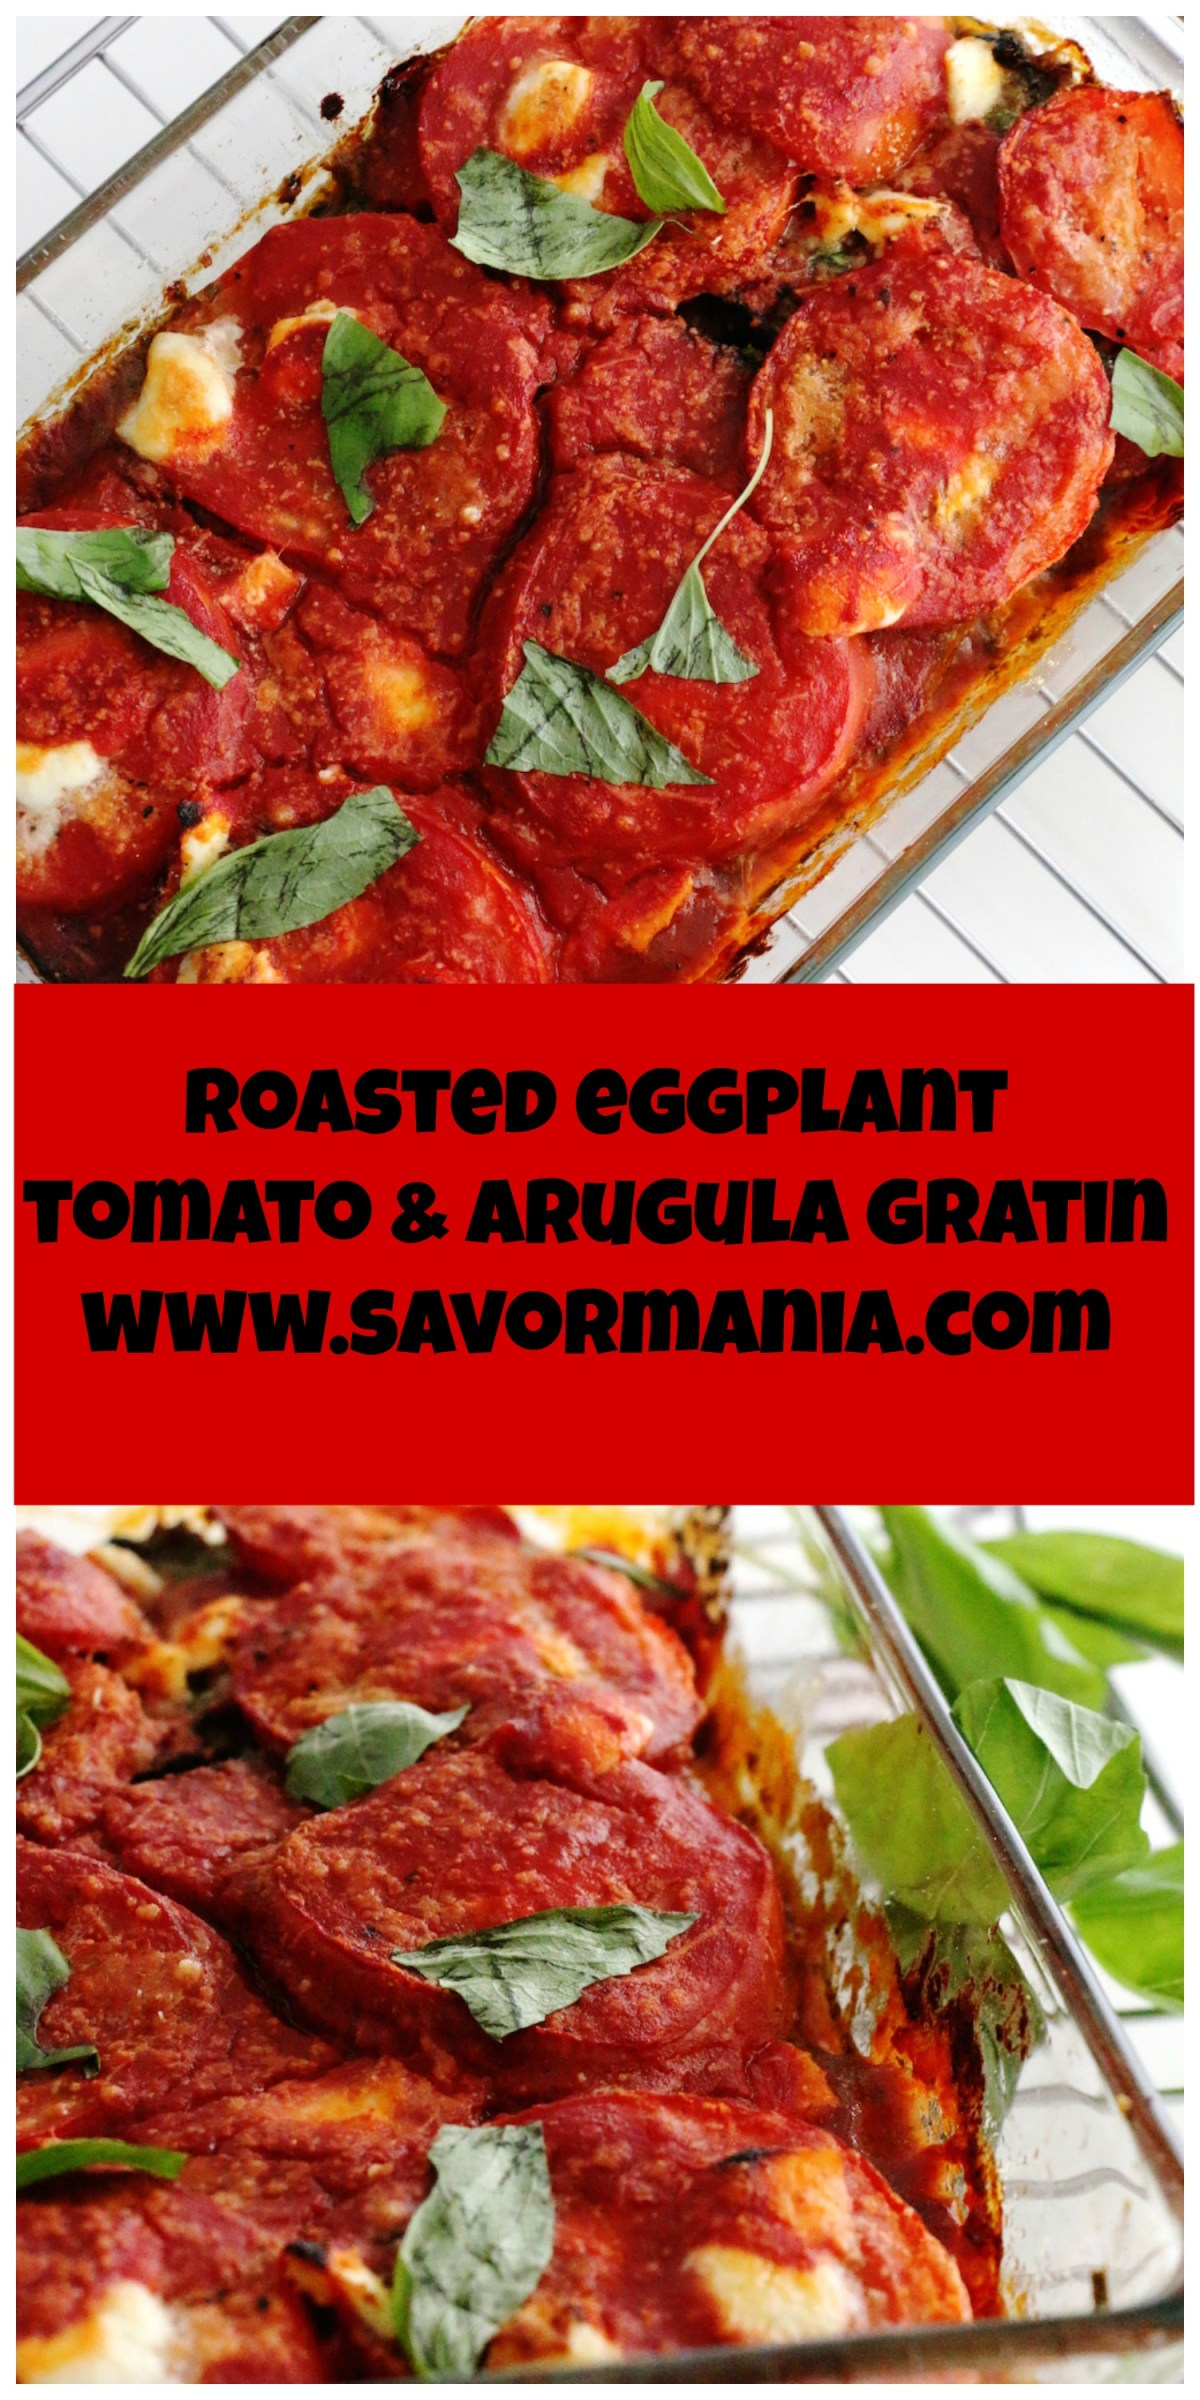 roasted eggplant tomato and arugula gratin | www.savormania.com